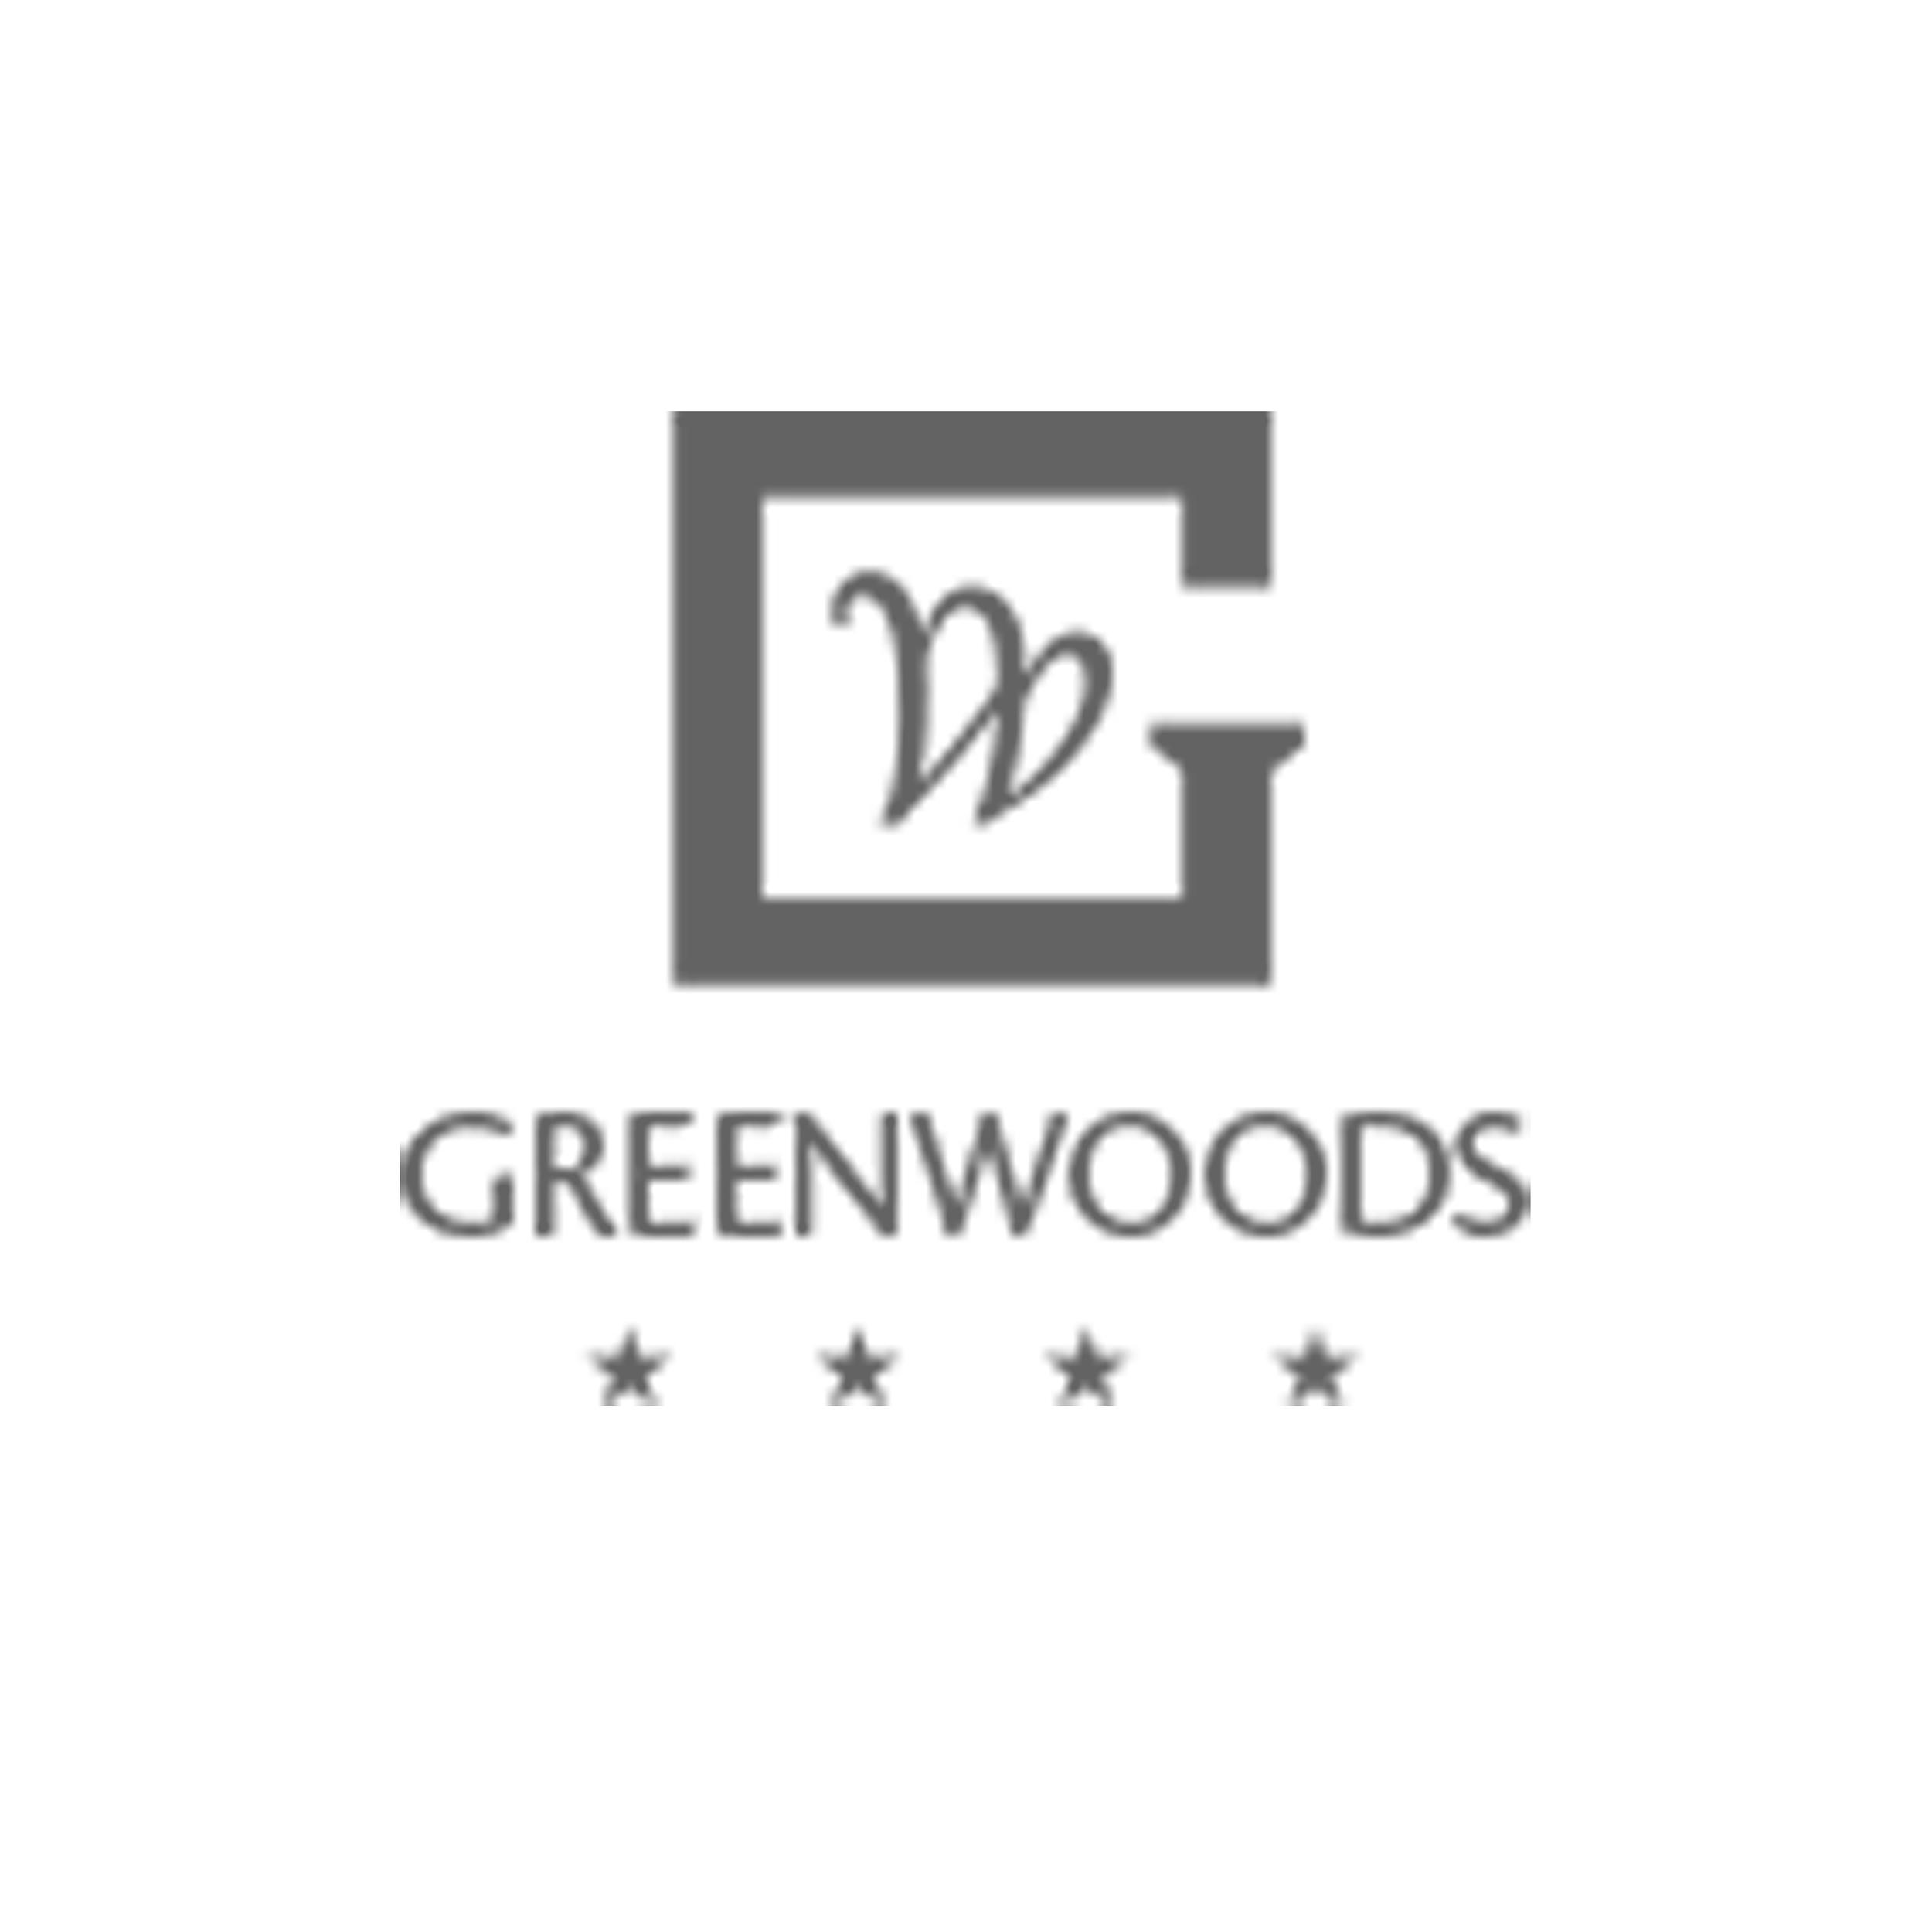 Greenwoods Hotel Group BW copy.jpg